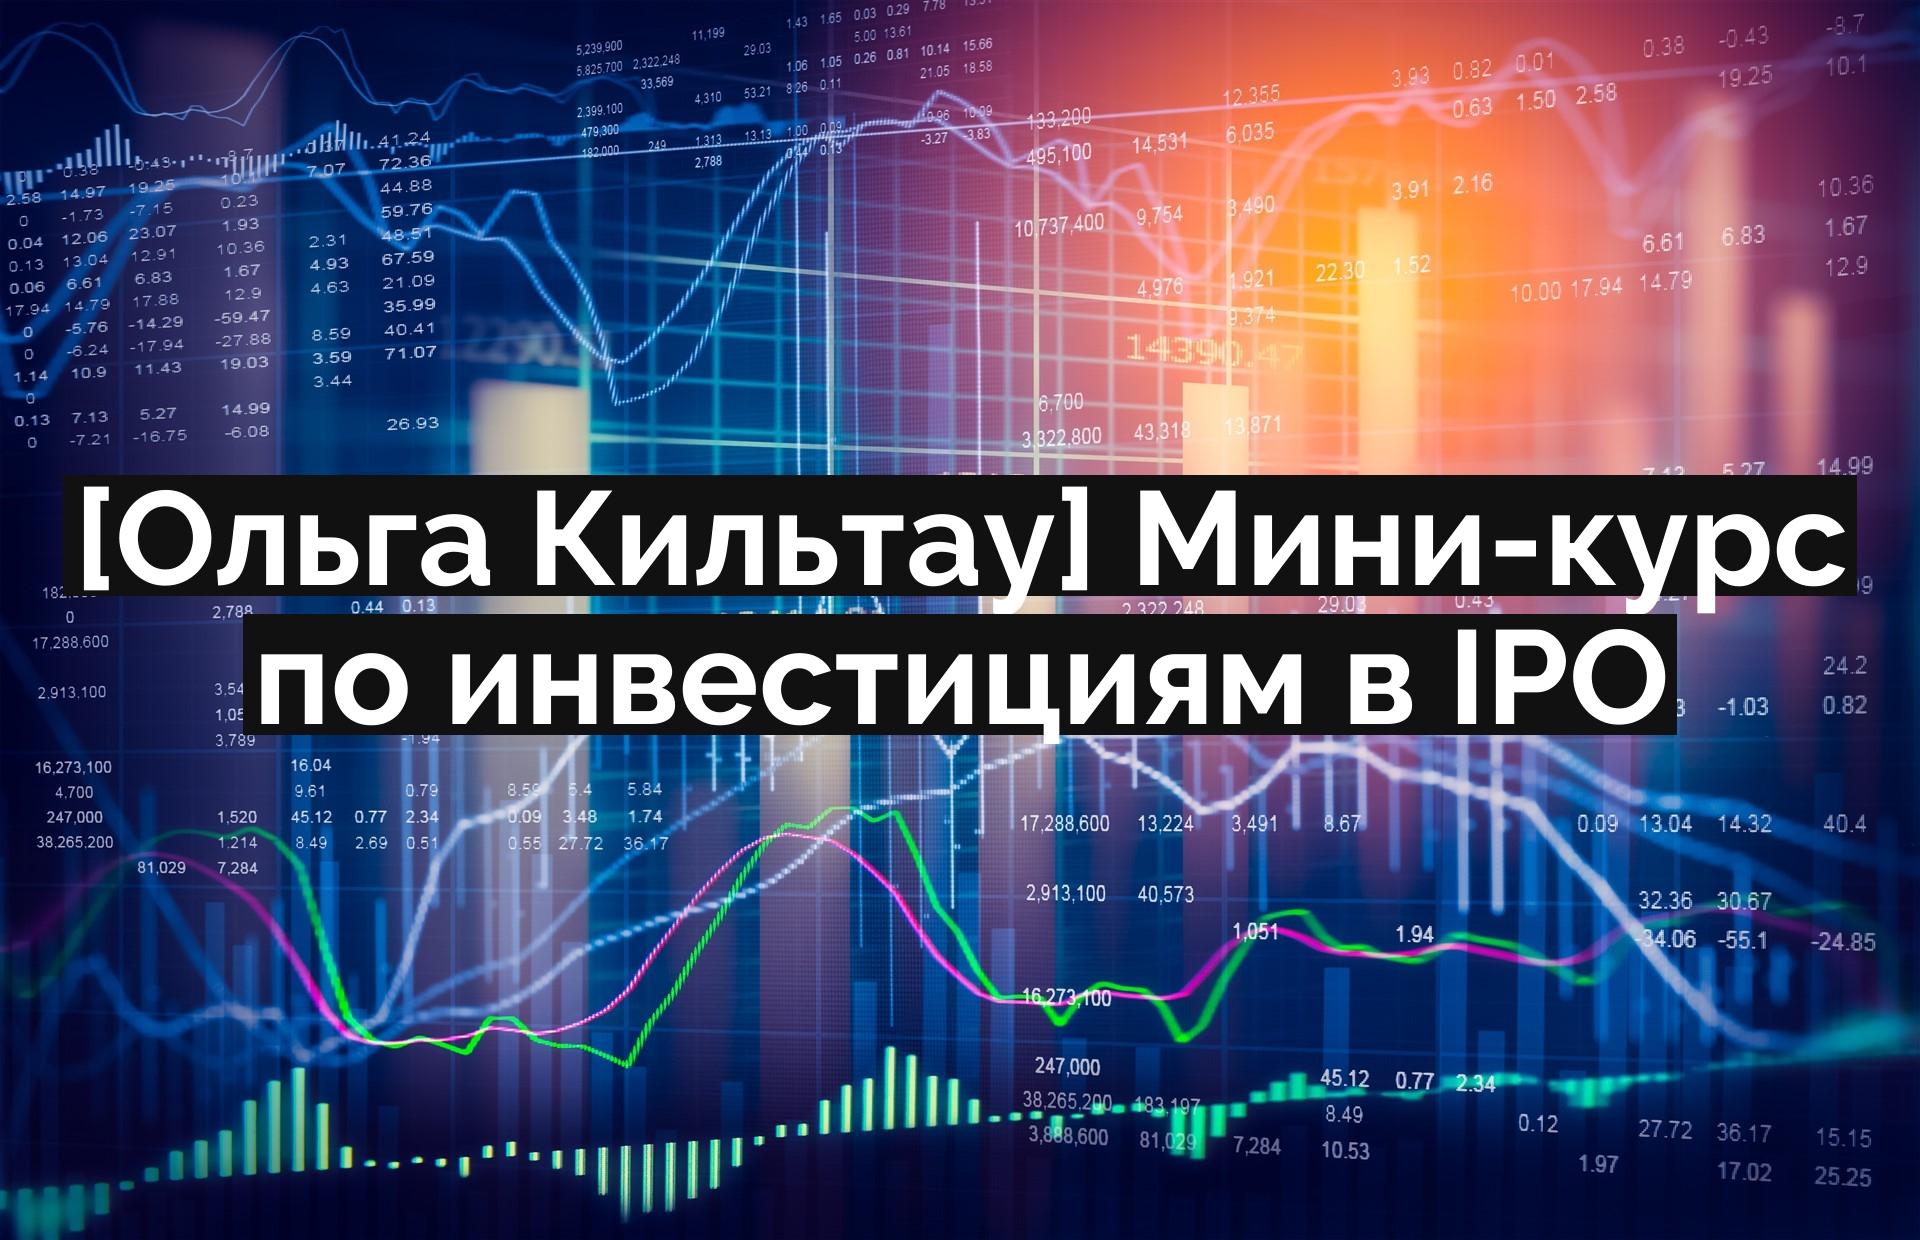 [Ольга Кильтау] Мини-курс по инвестициям в IPO